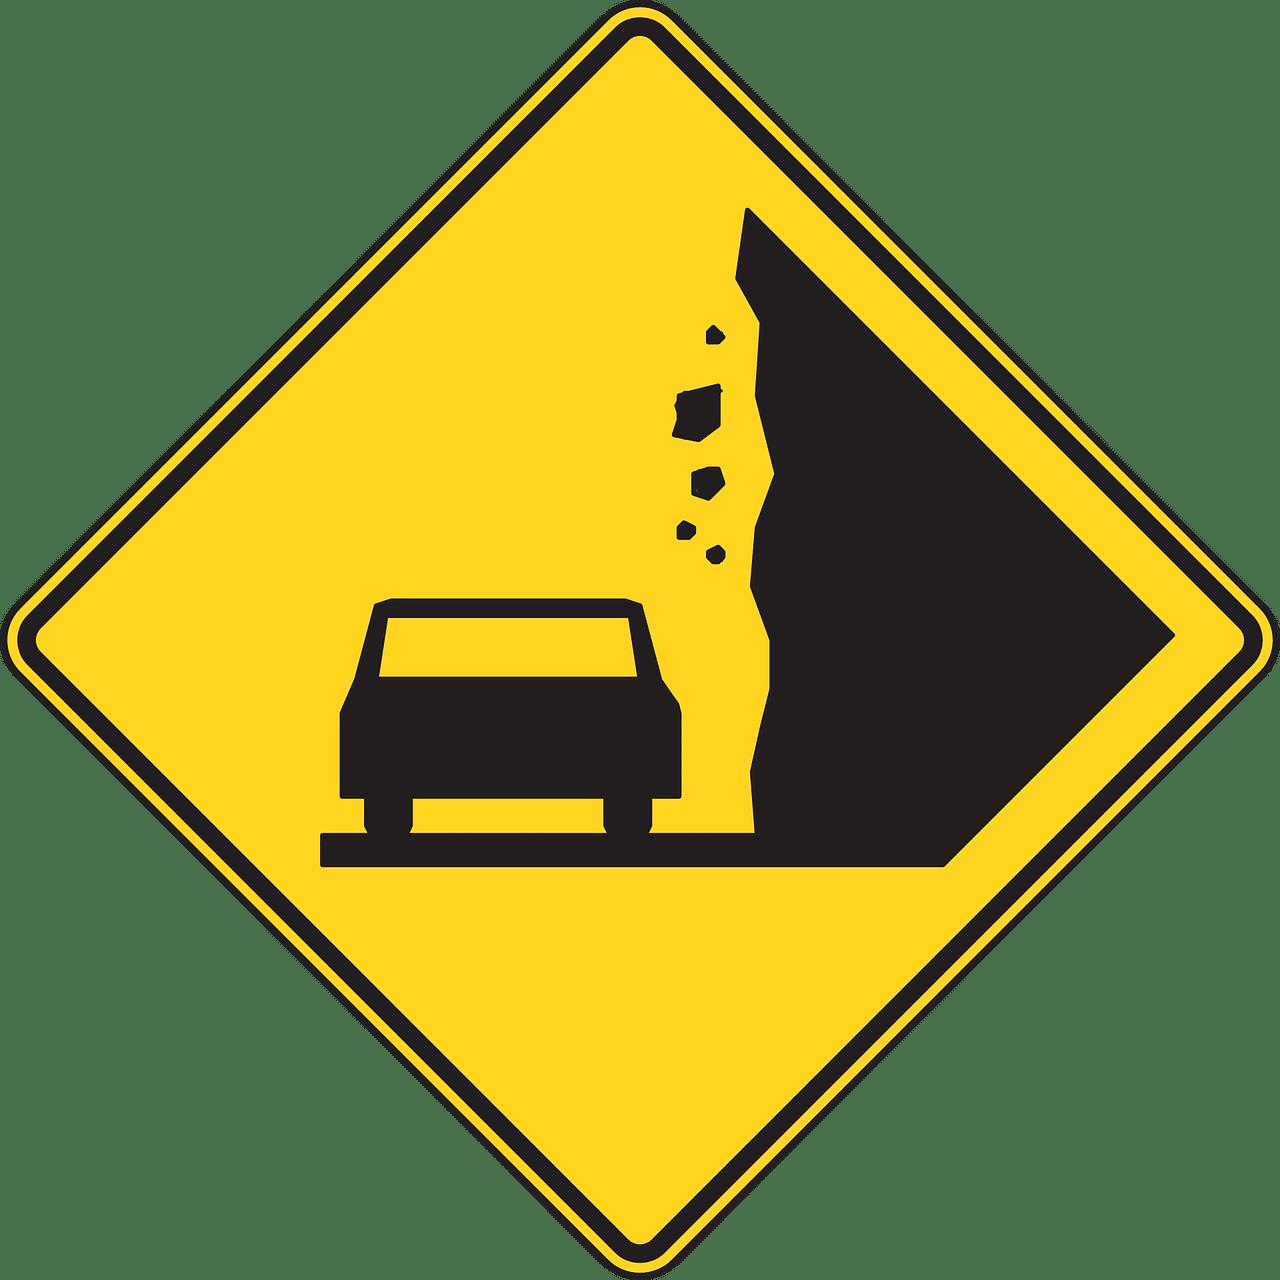 falling-cliff-traffic-sign